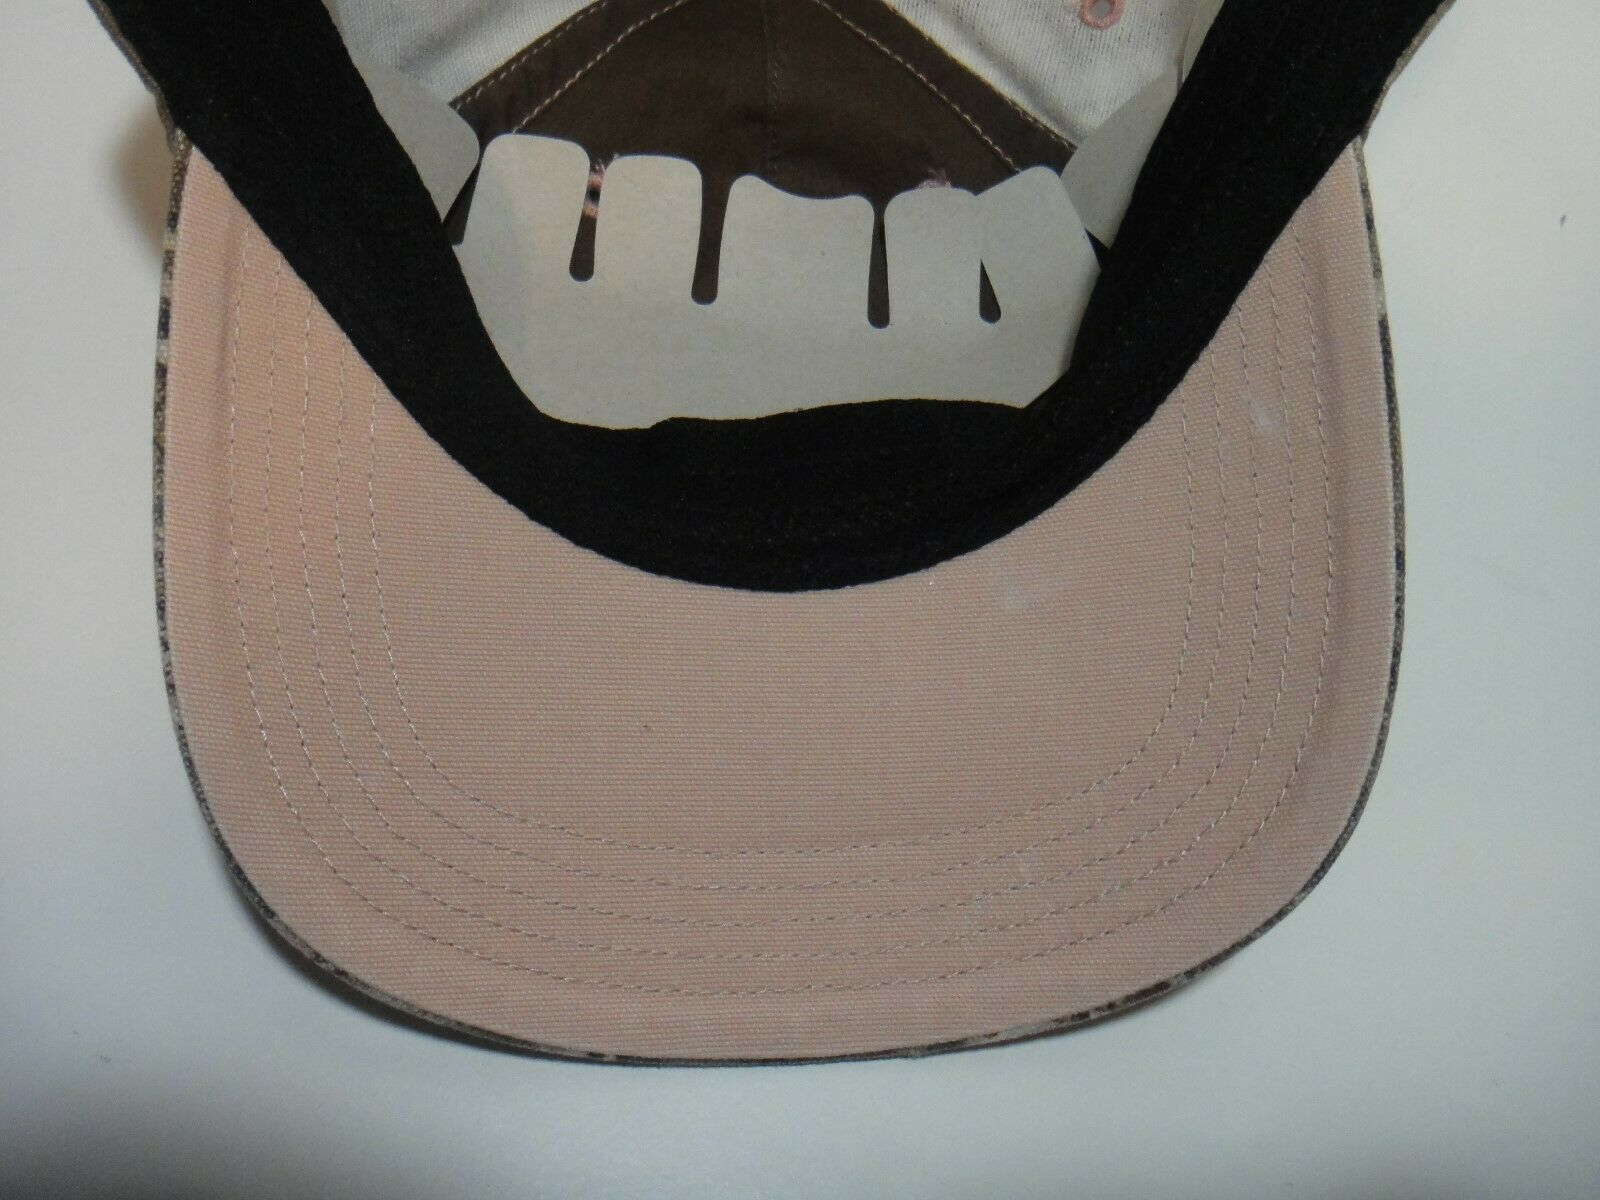 Carhartt Womens Realtree Xtra Camo Hat Color Pink Camo Size Adjustable